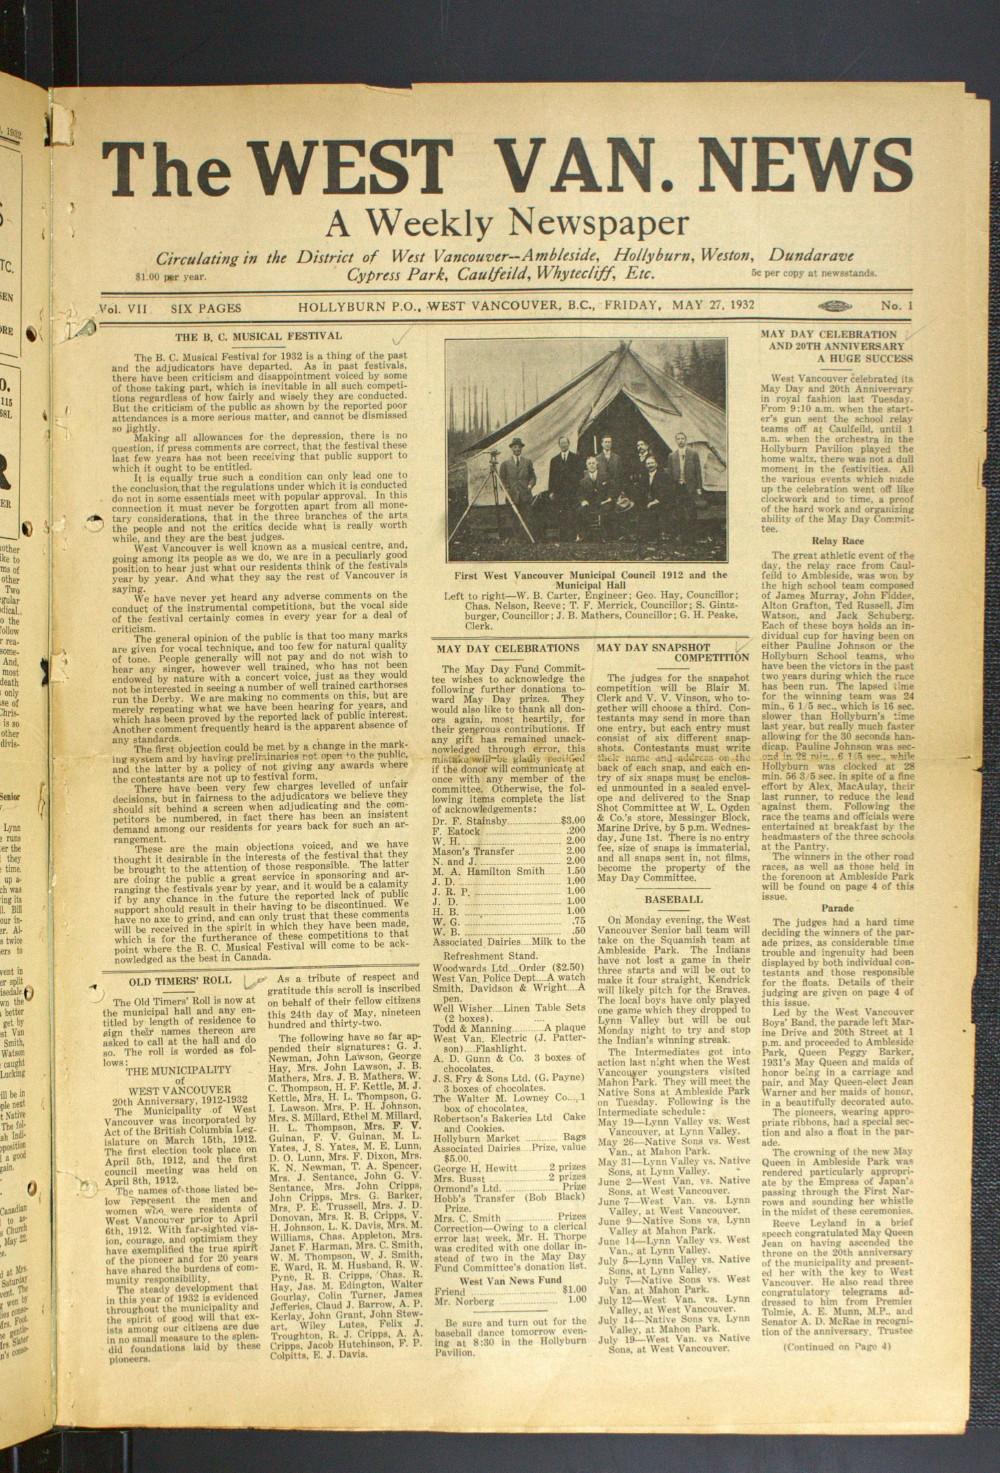 West Van. News (West Vancouver), 27 May 1932